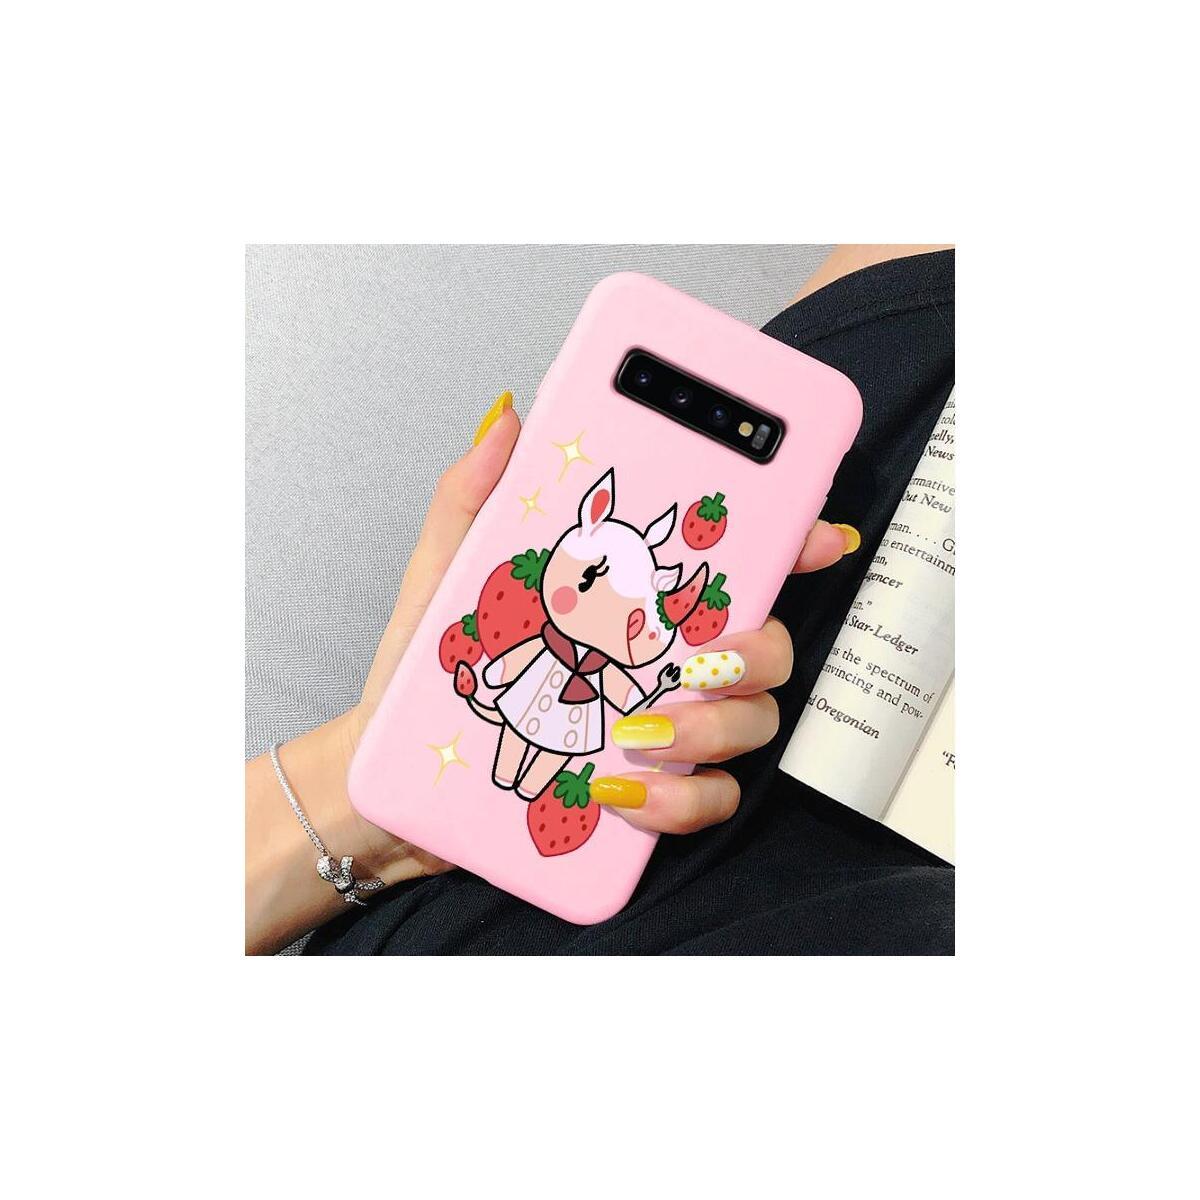 Animal Crossing New Horizons phone case for Samsung Galaxy, s10 plus / FHSR-494